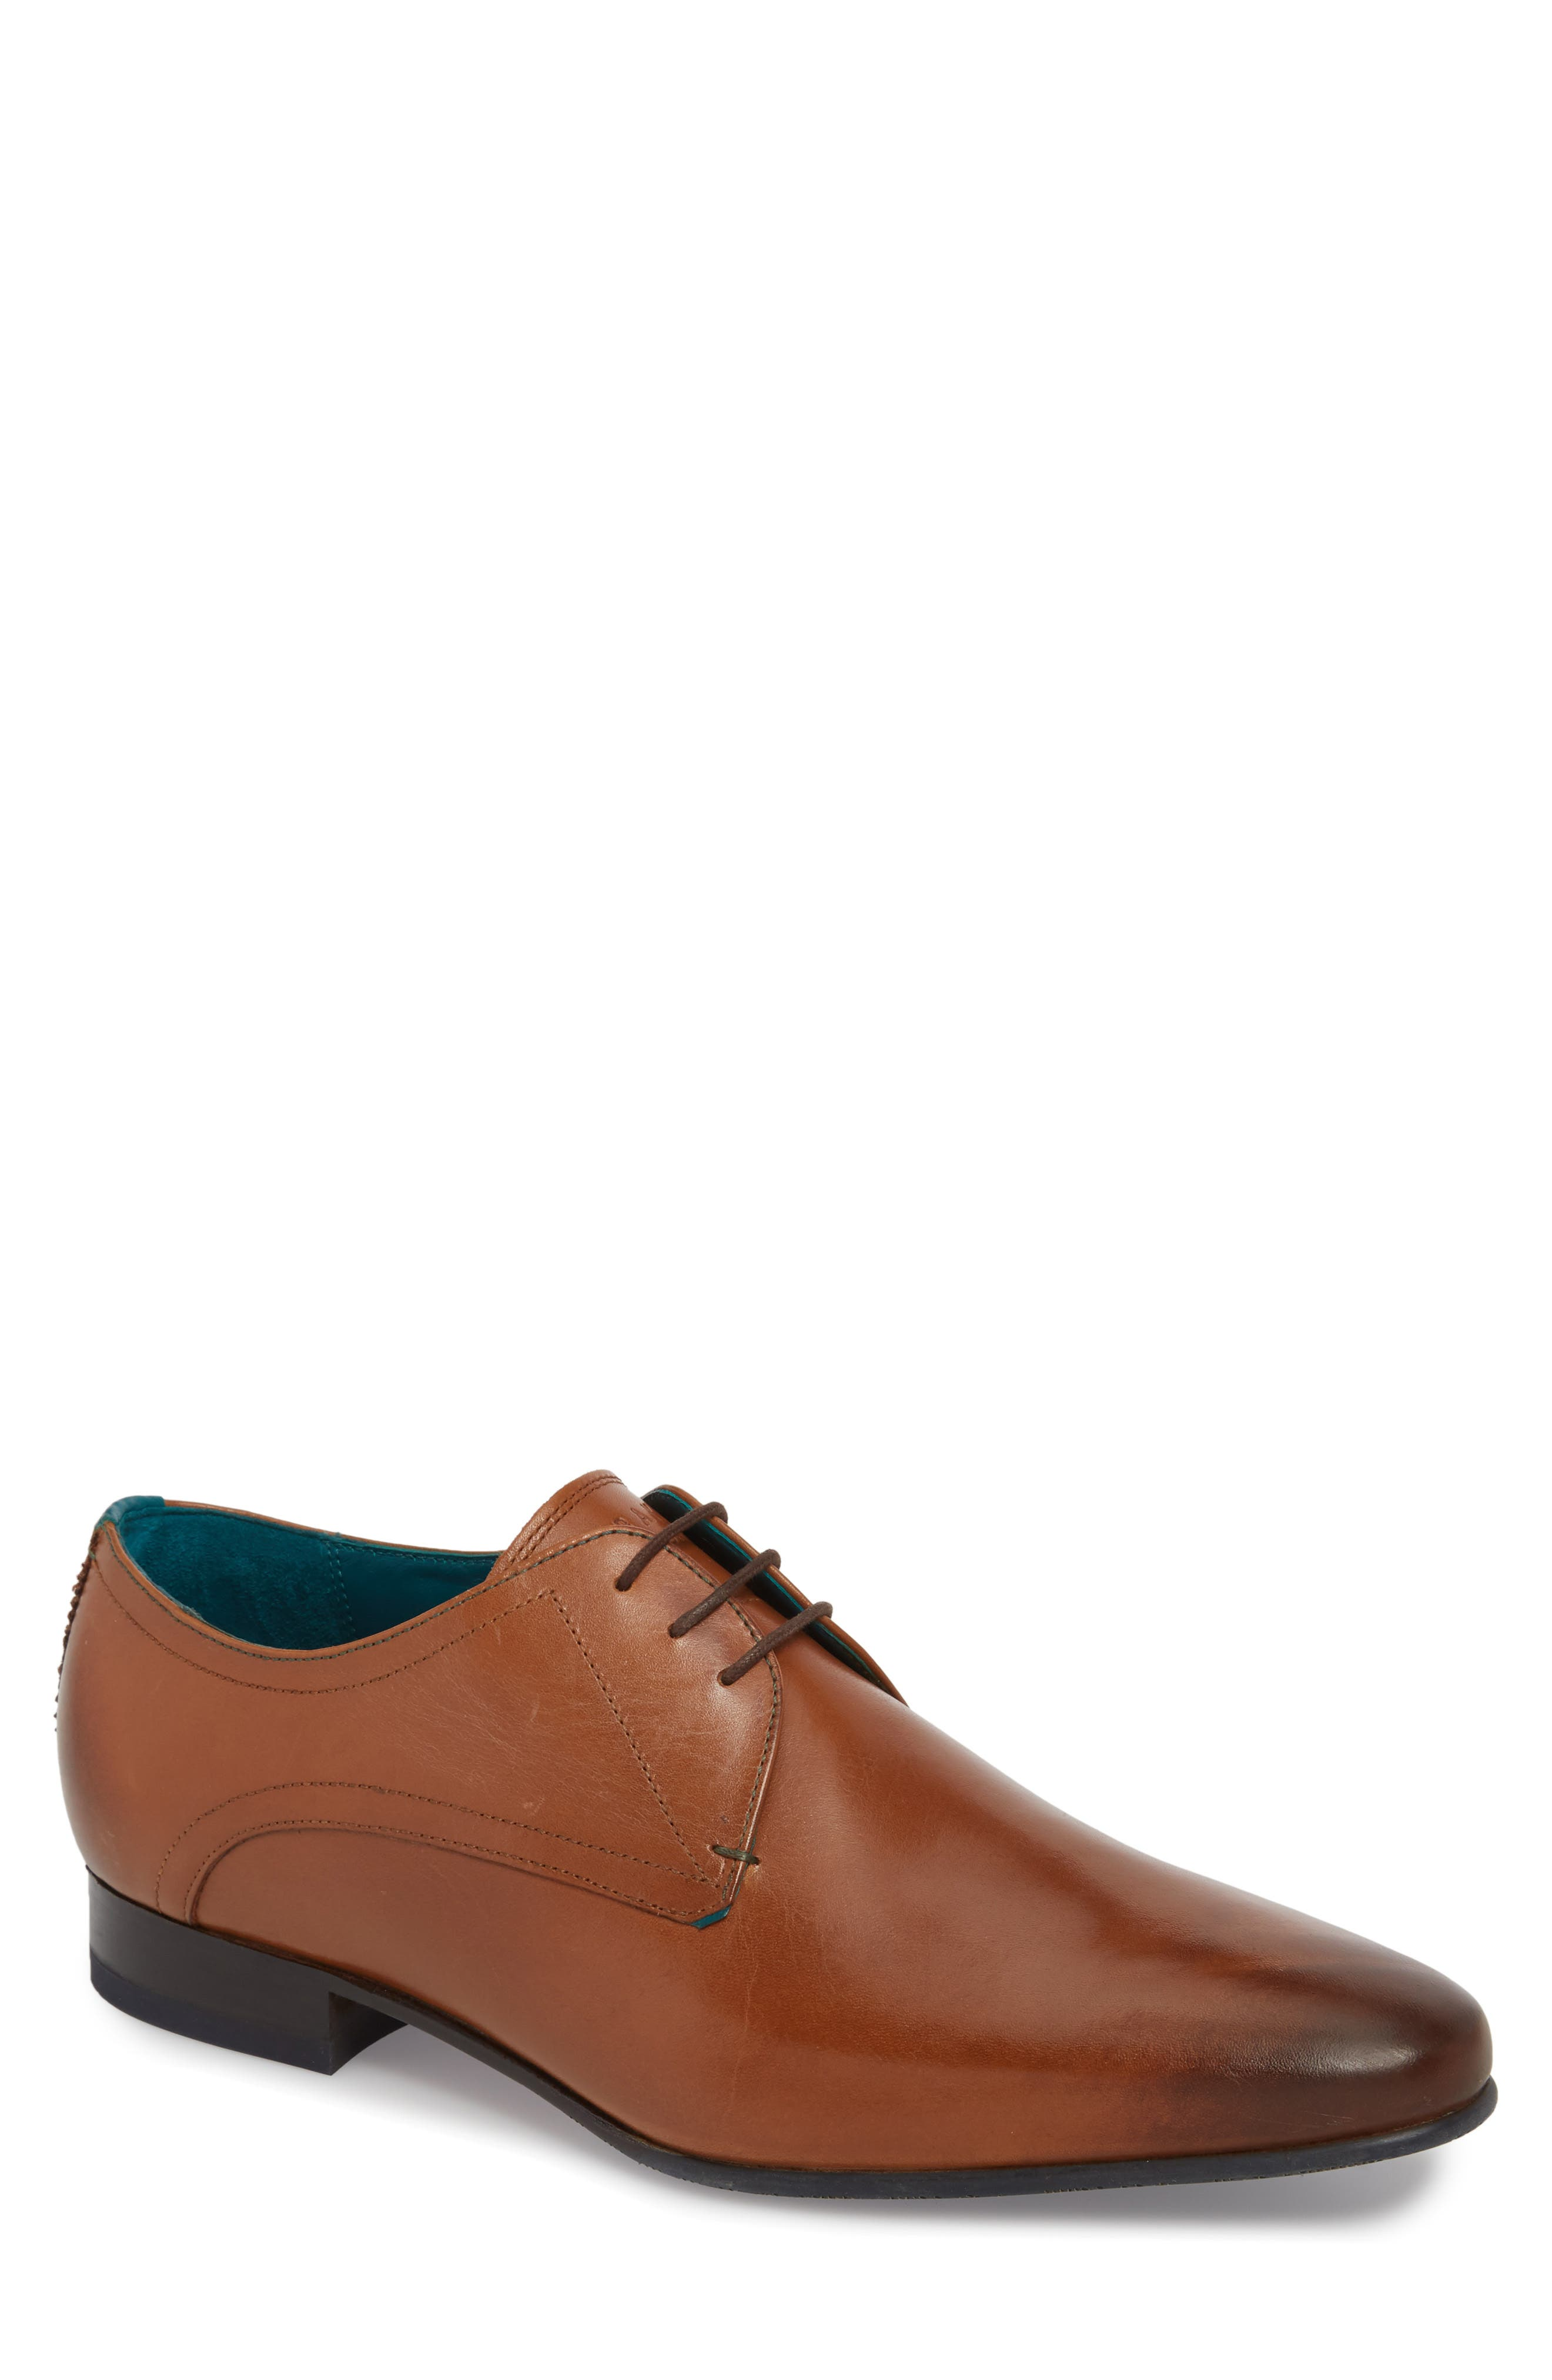 Bhartli Plain Toe Derby,                             Main thumbnail 1, color,                             Tan Leather